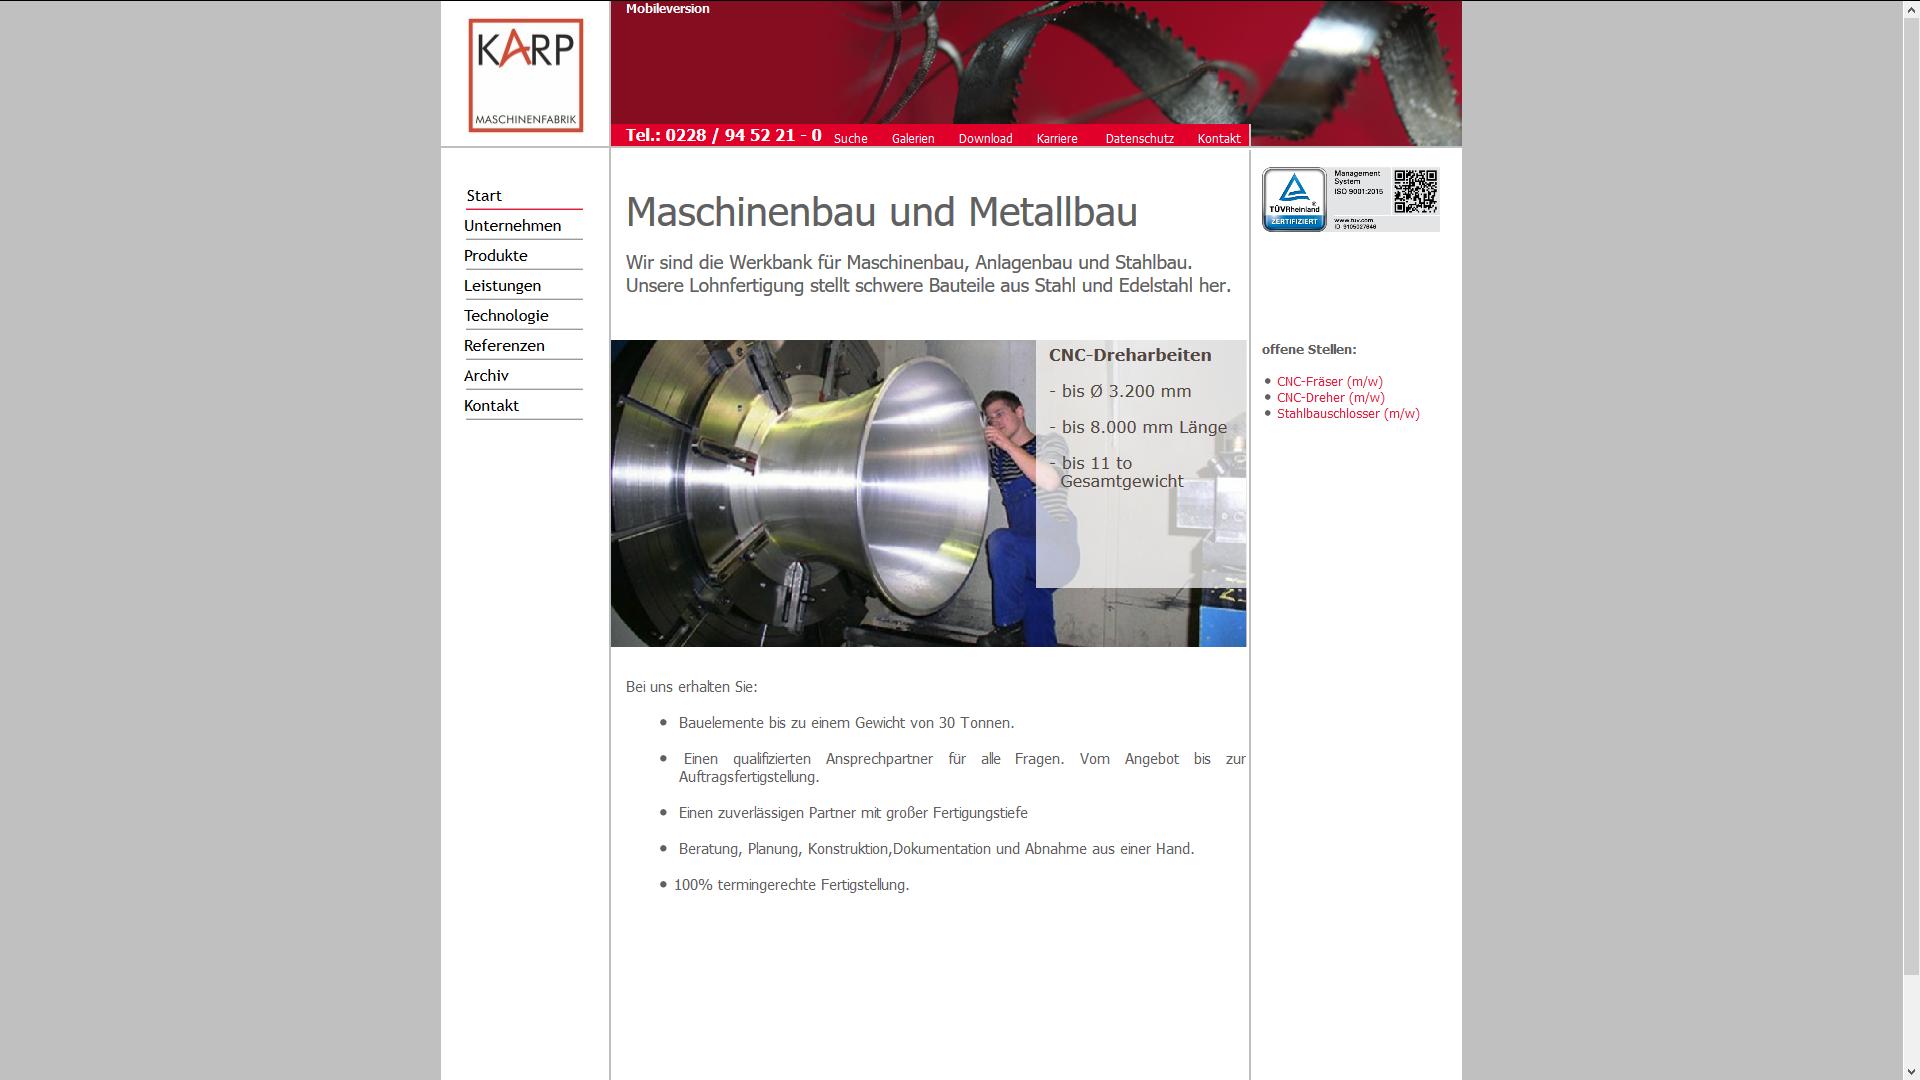 karp-maschinenfabrik